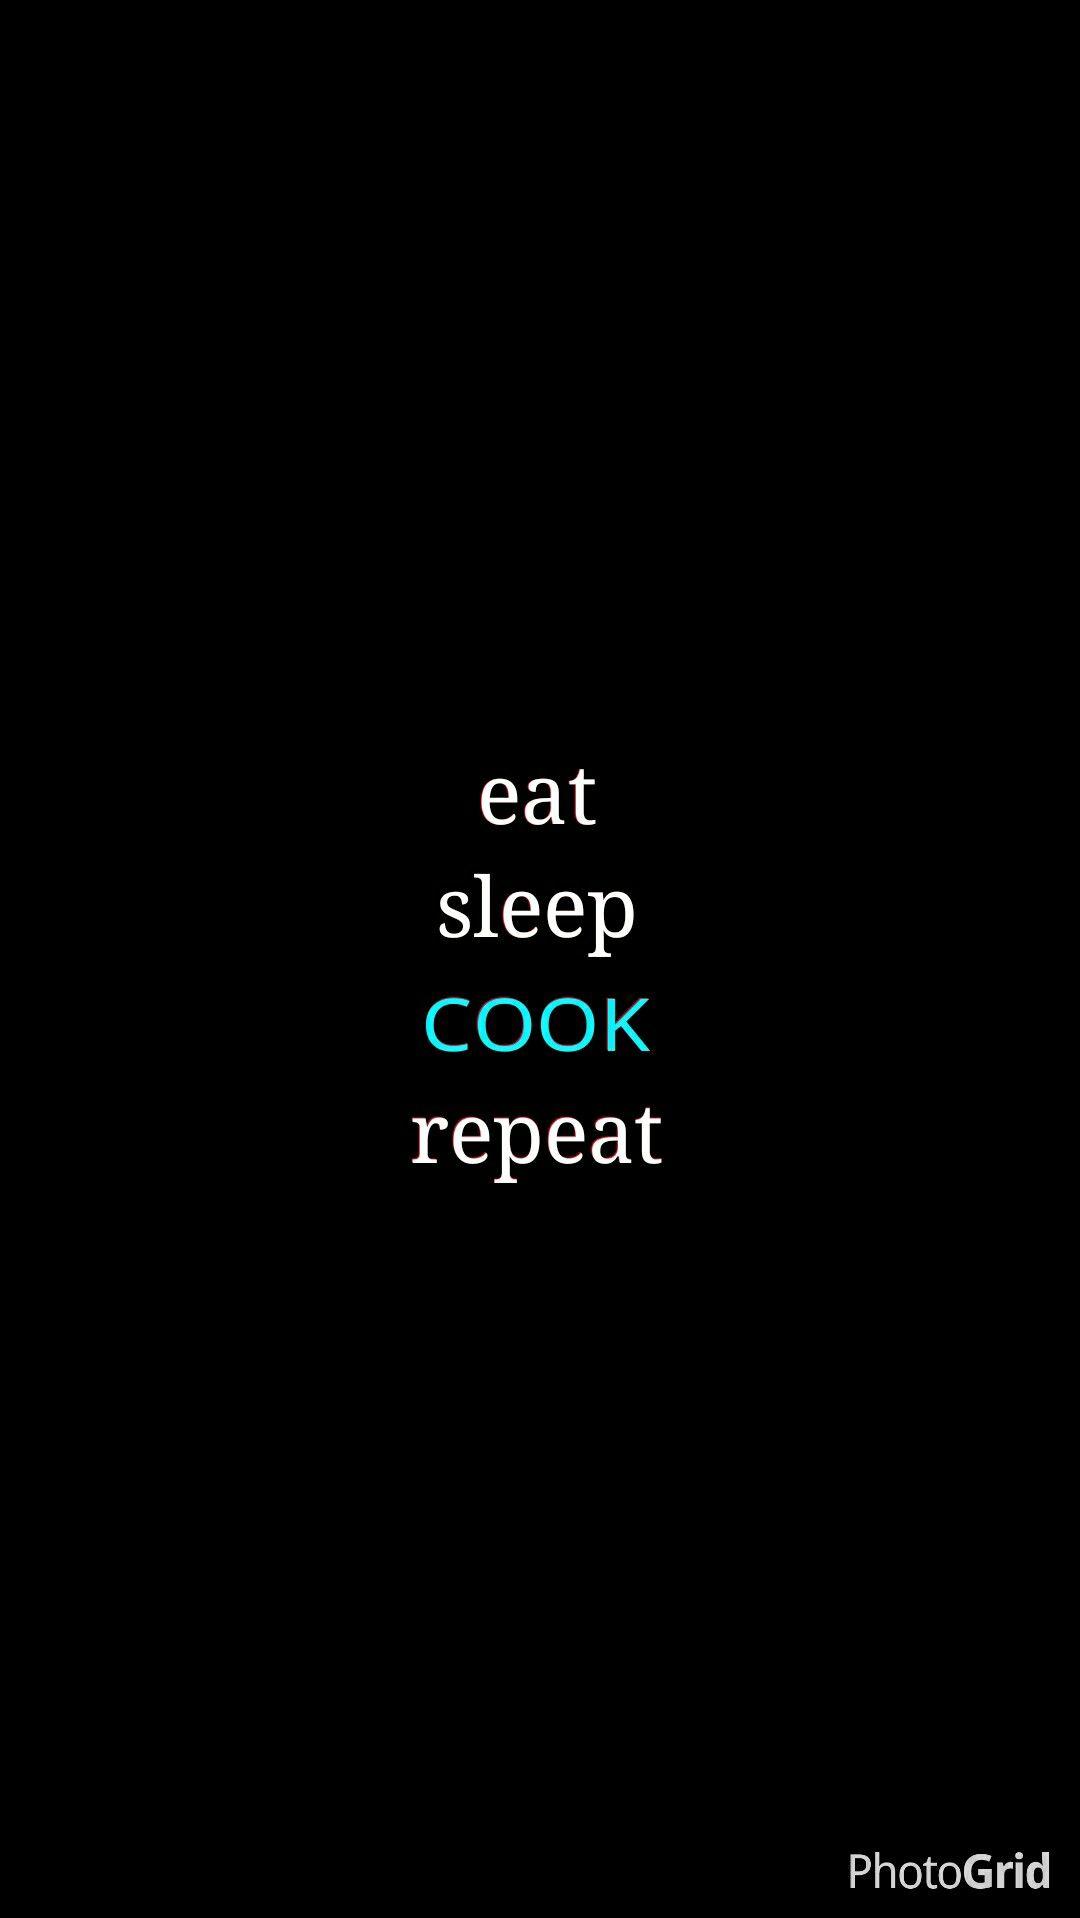 eat #sleep #cook #wallpaper #iphone | nicolicious | pinterest